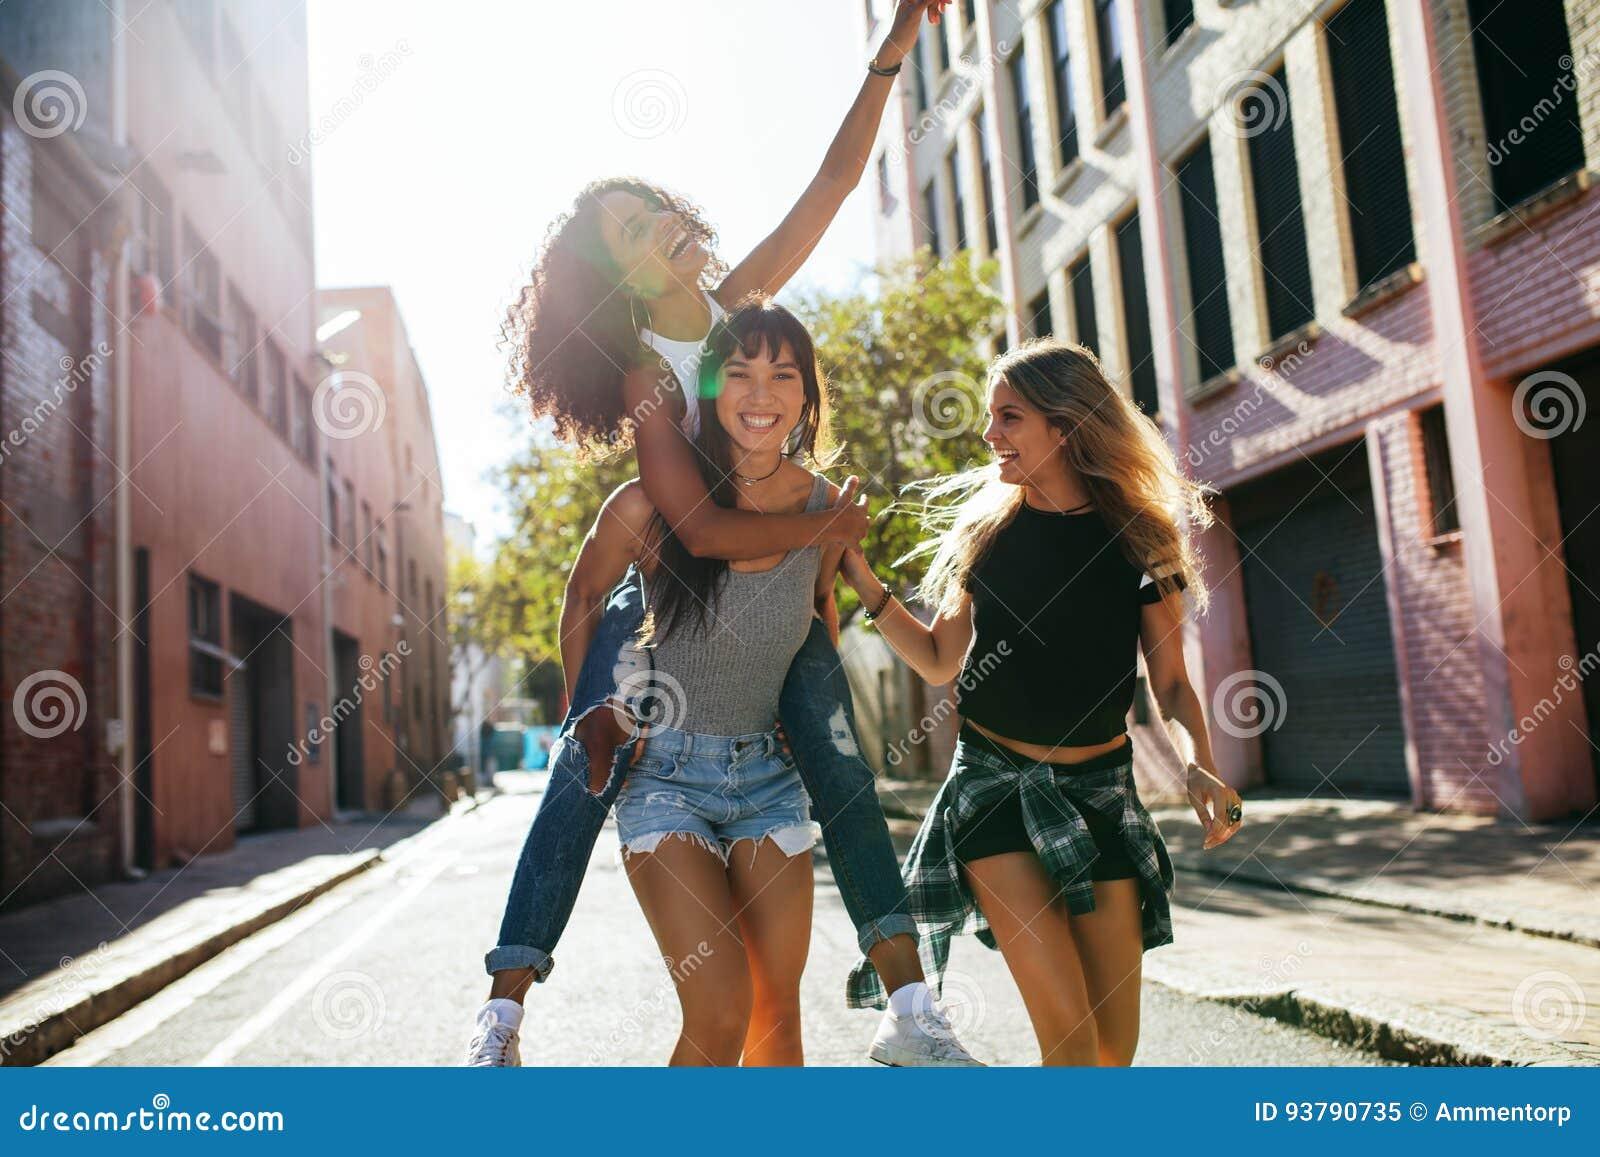 Three young woman having fun on city street